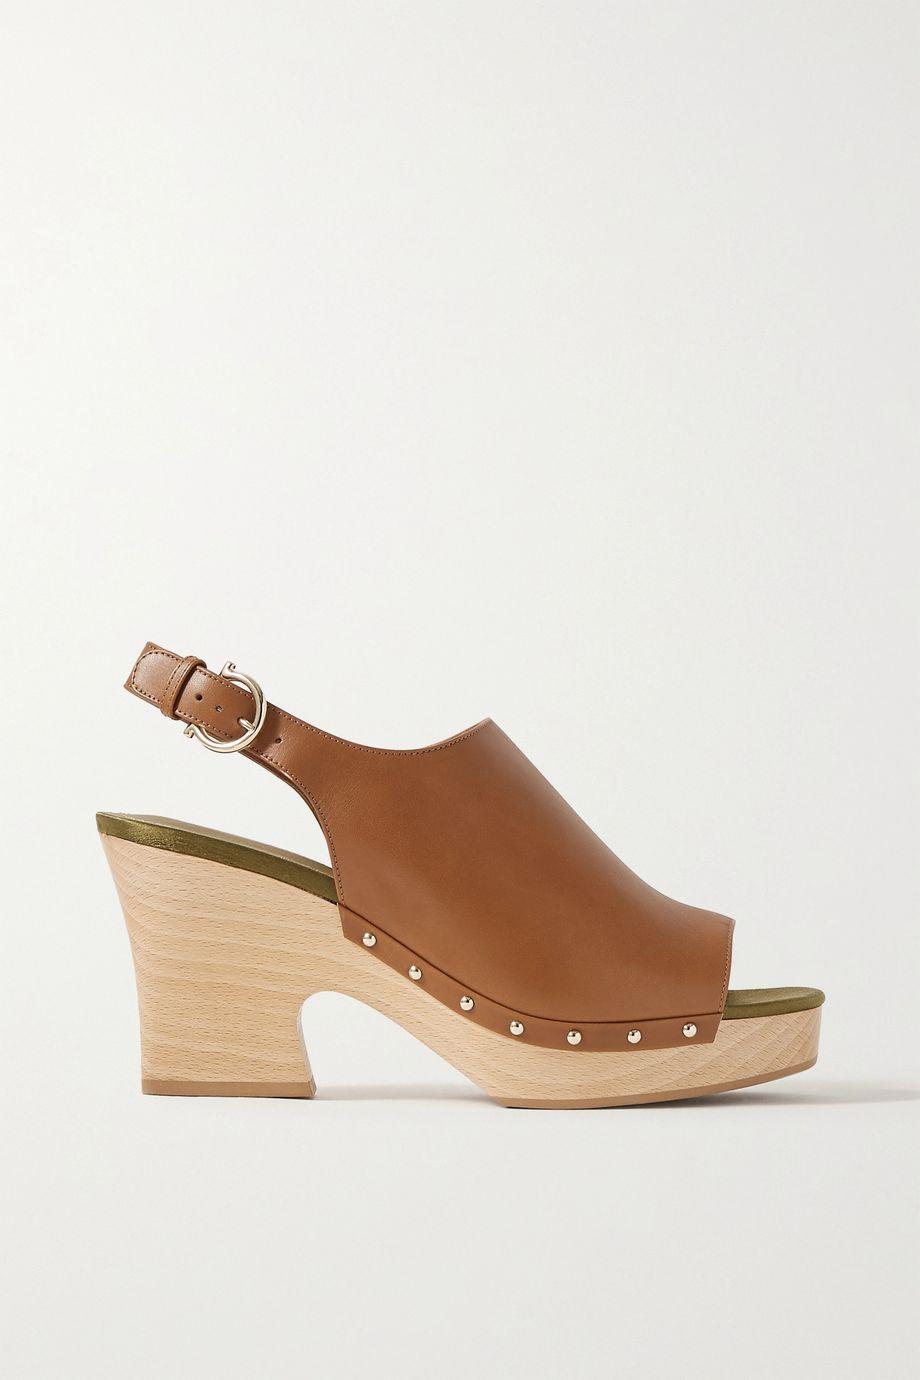 Salvatore Ferragamo Susanne leather slingback sandals